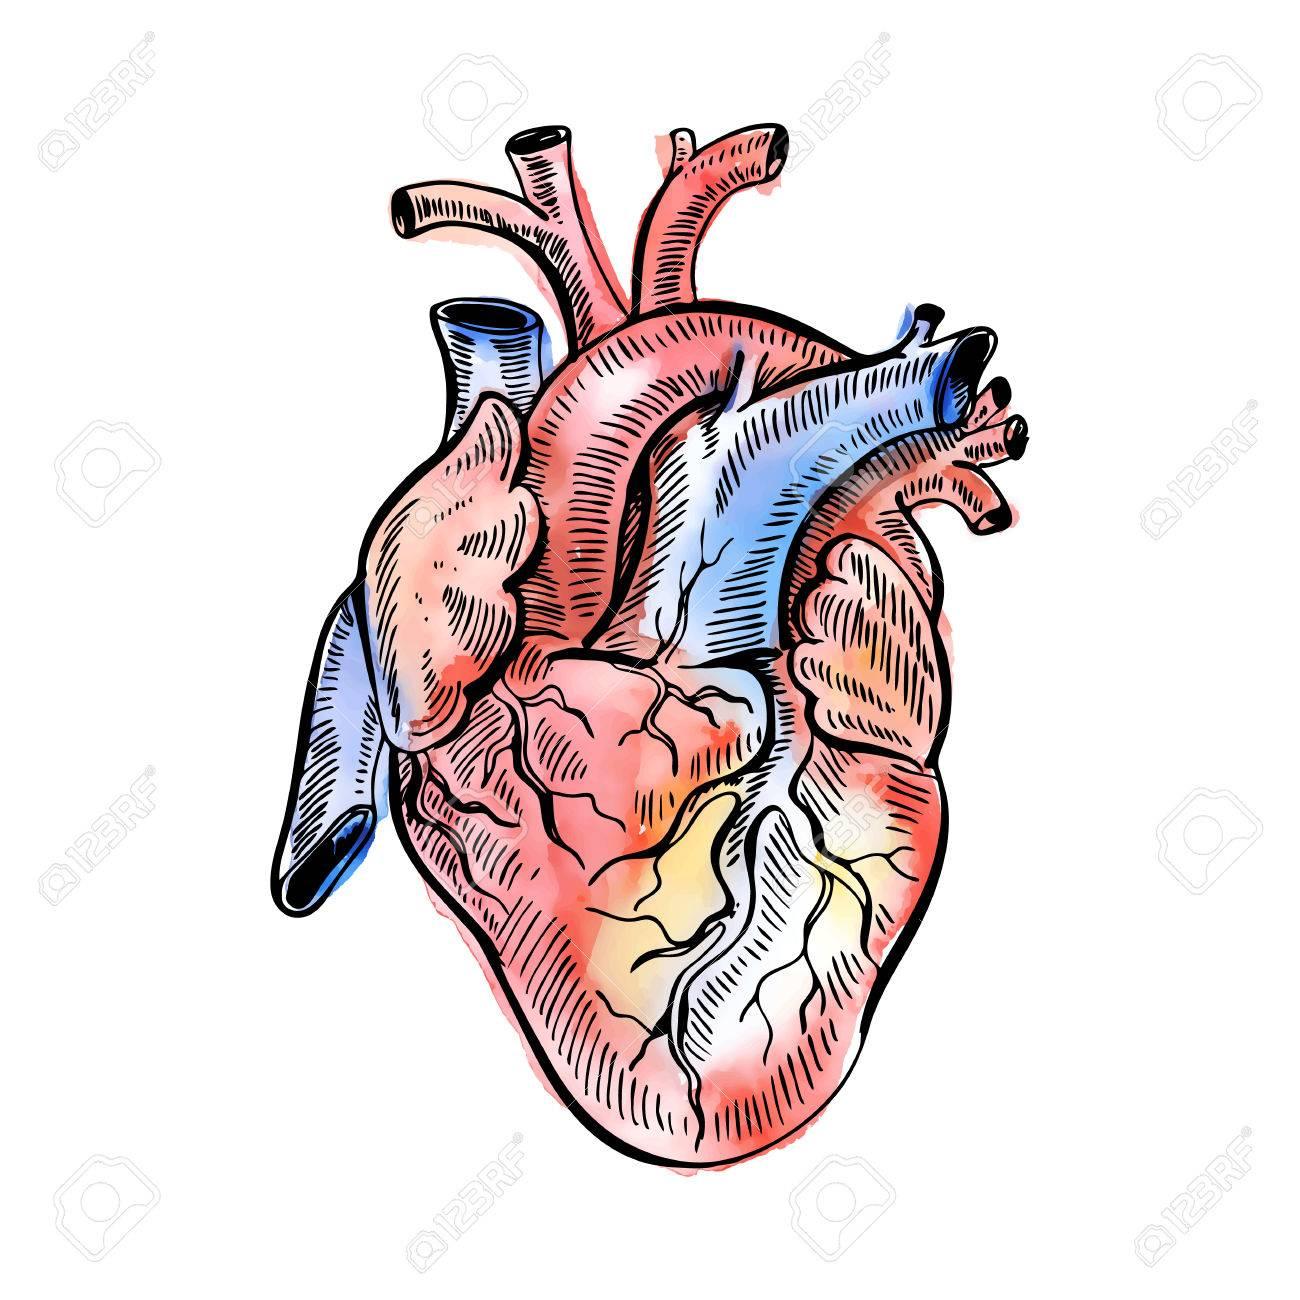 Hand Drawing Watercolor Sketch Anatomical Heart Royalty Free